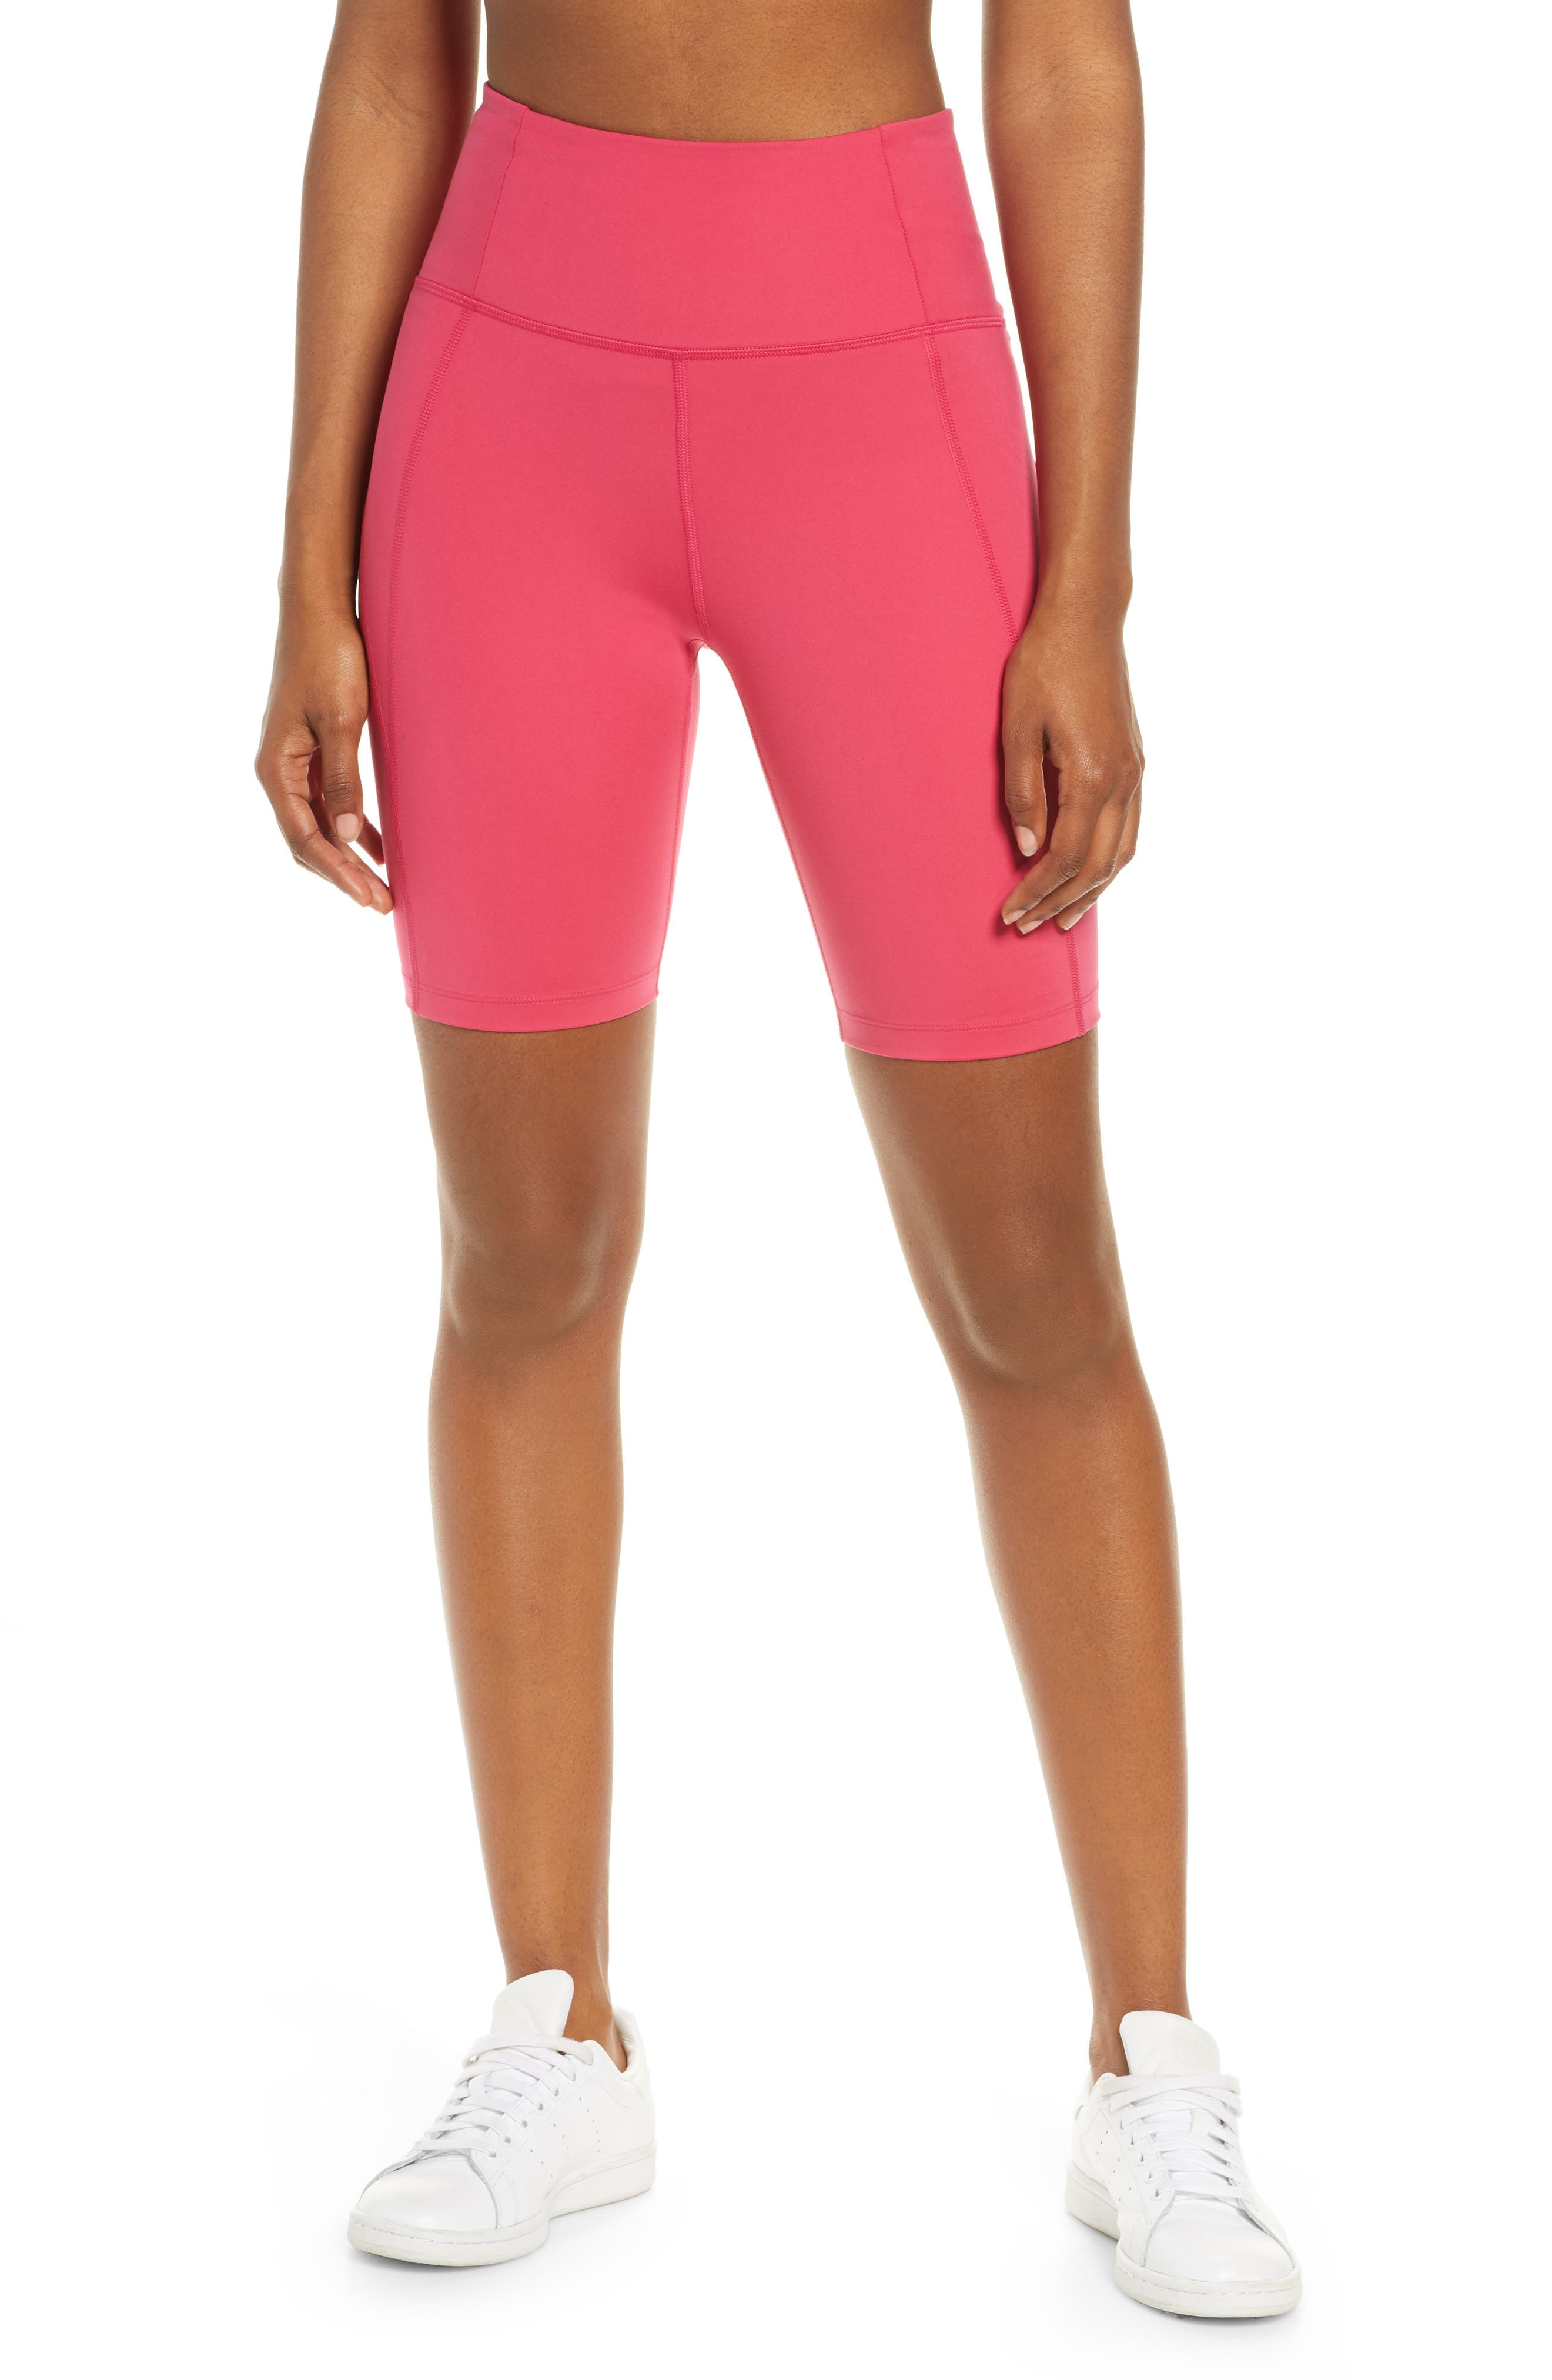 Plus  Women's Girlfriend Collective High Waist Bike Shorts,  XX-Large - Pink